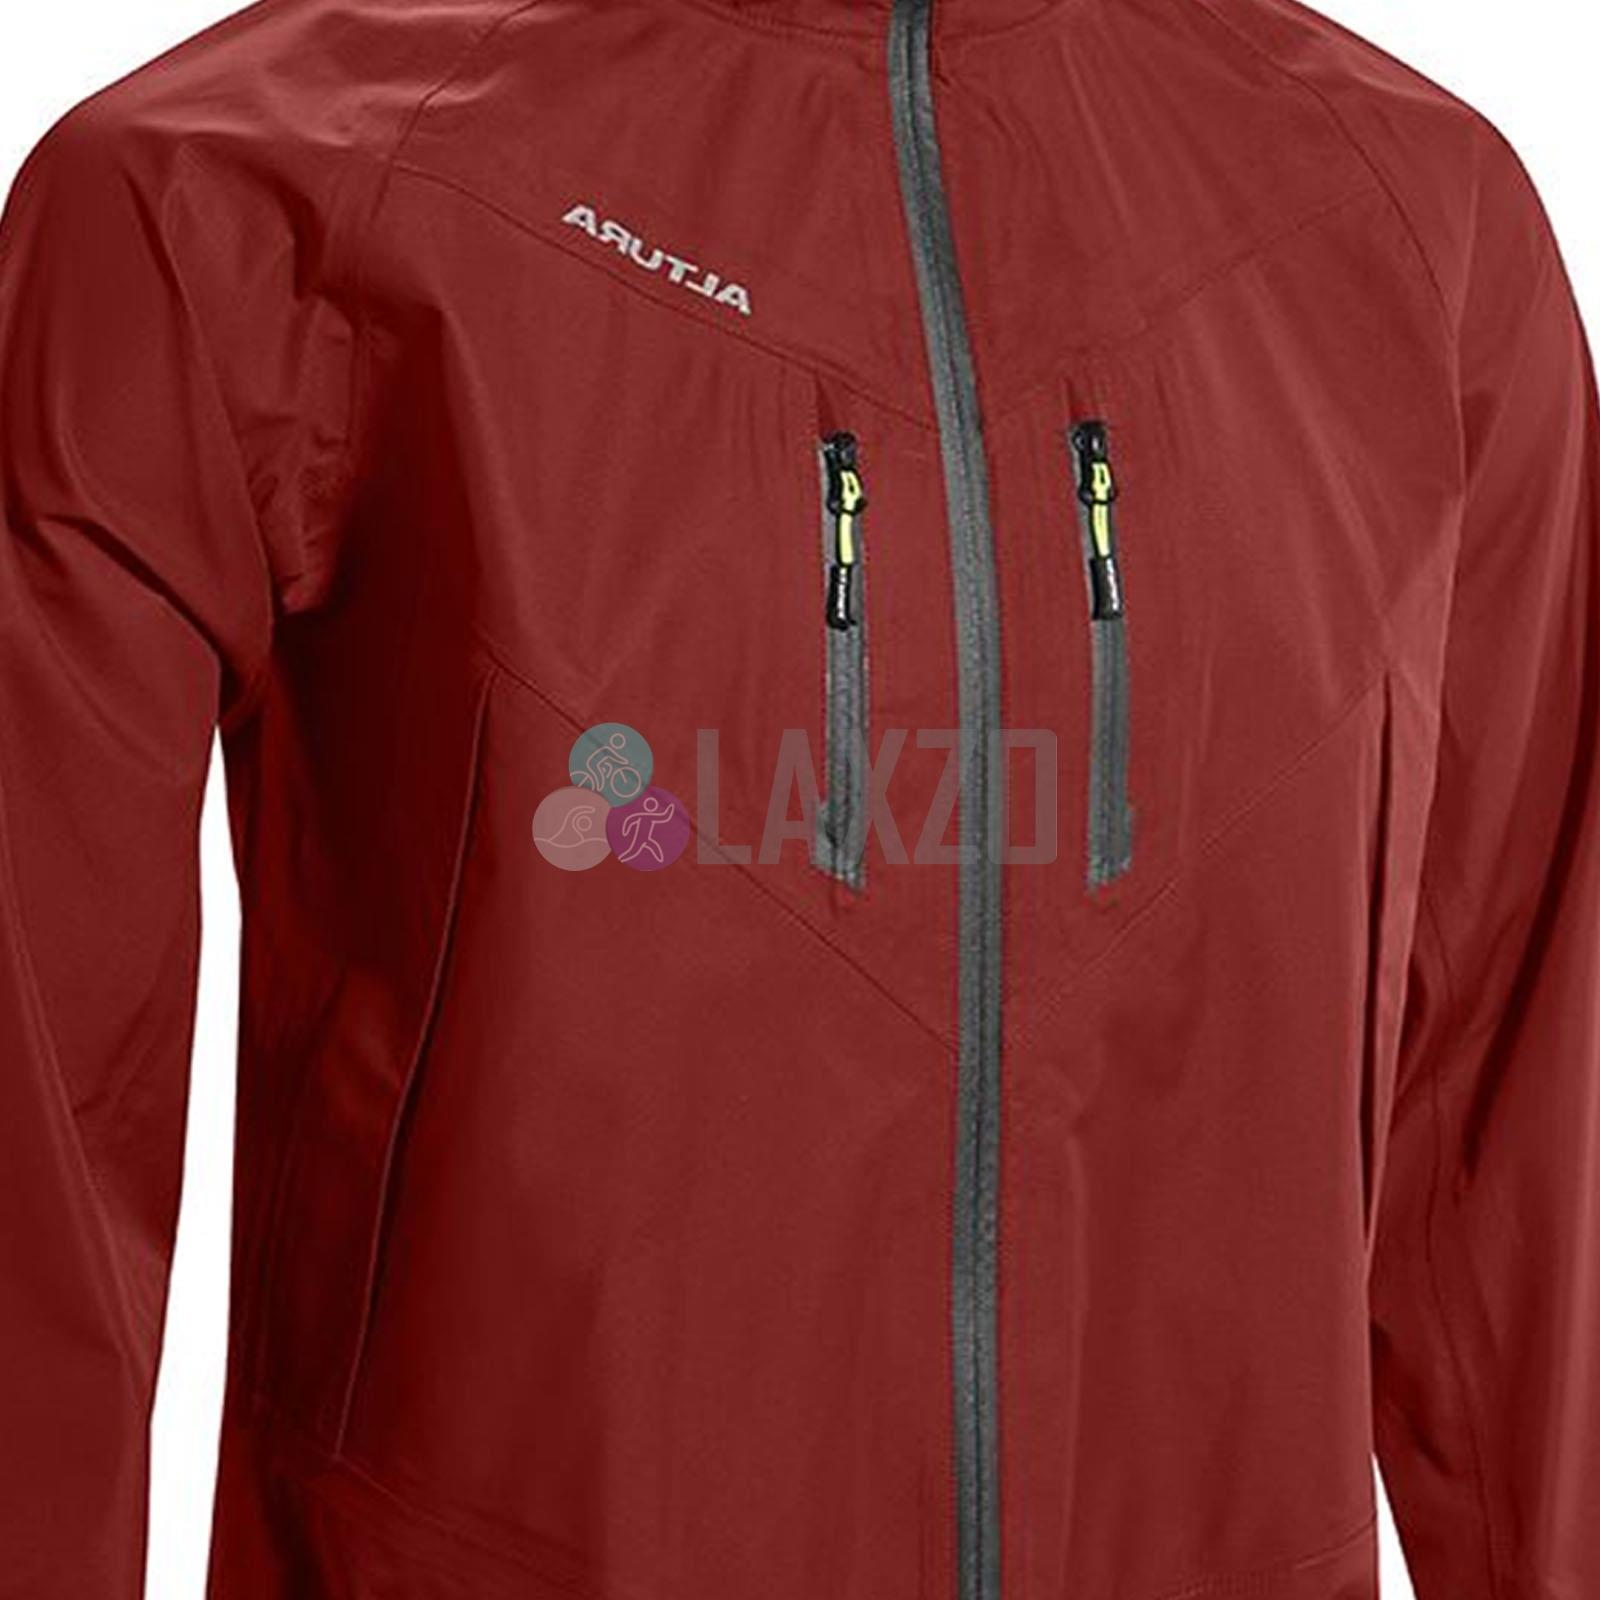 AP57 Reebok Warm Up Jacket Full Zip Youth Extra Large Black New IHH